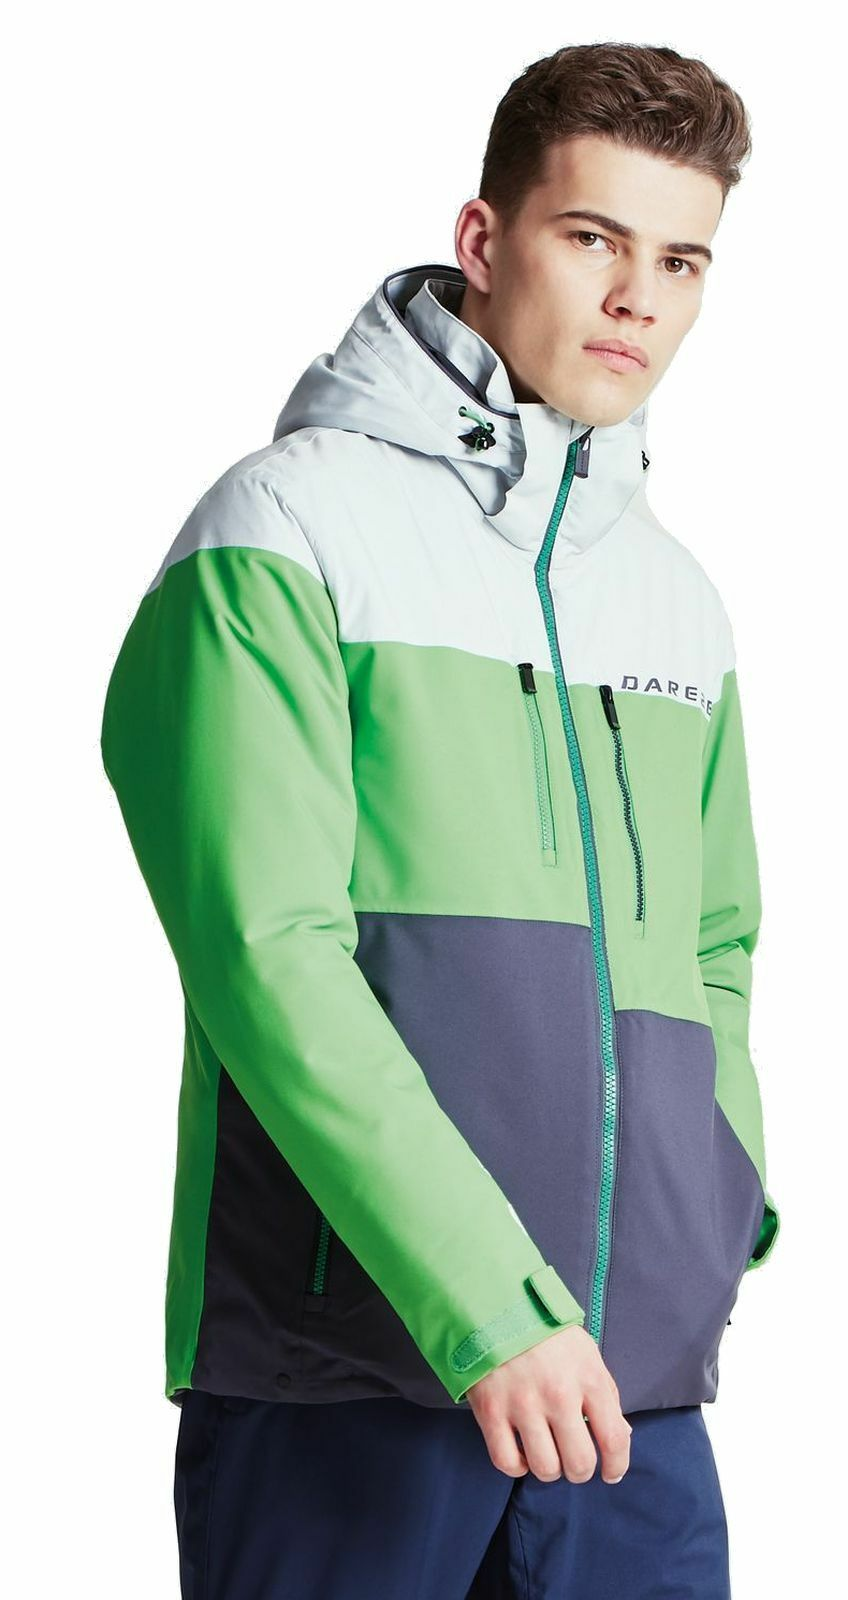 Dare2b Herren Ski Jacke Skijacke ROAMER PRO JACKET grau grün